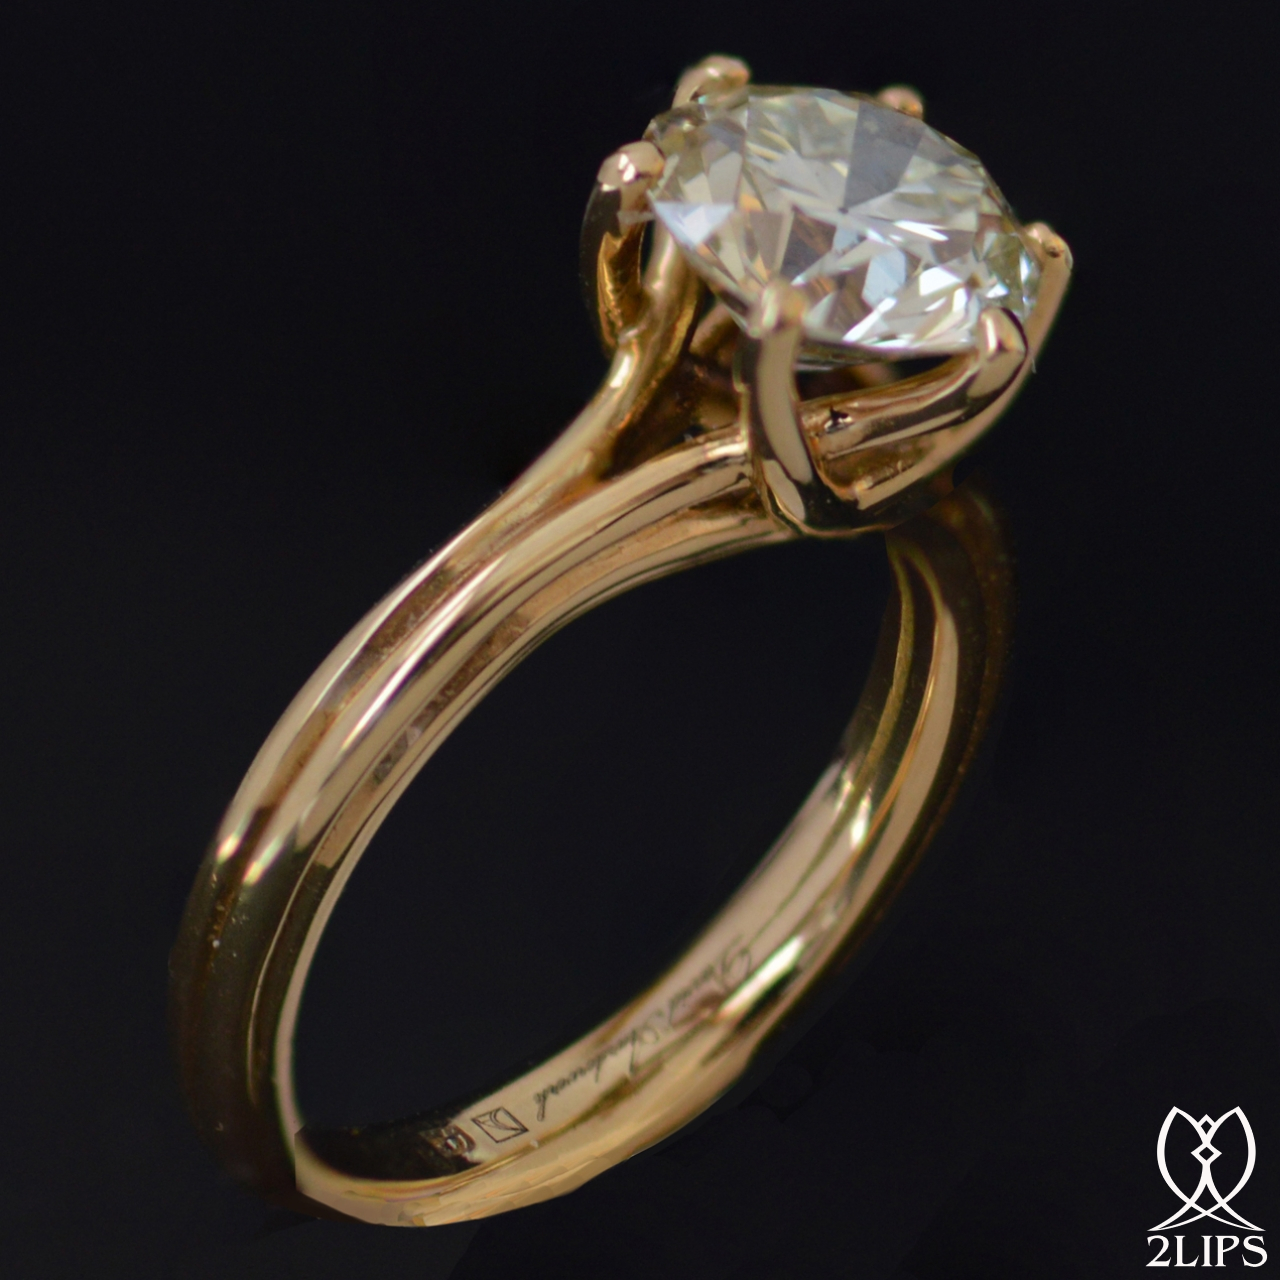 2lips-de-mooiste-verlovingsring-2-33-crt-t-s-colour-solitair-briljant-diamant